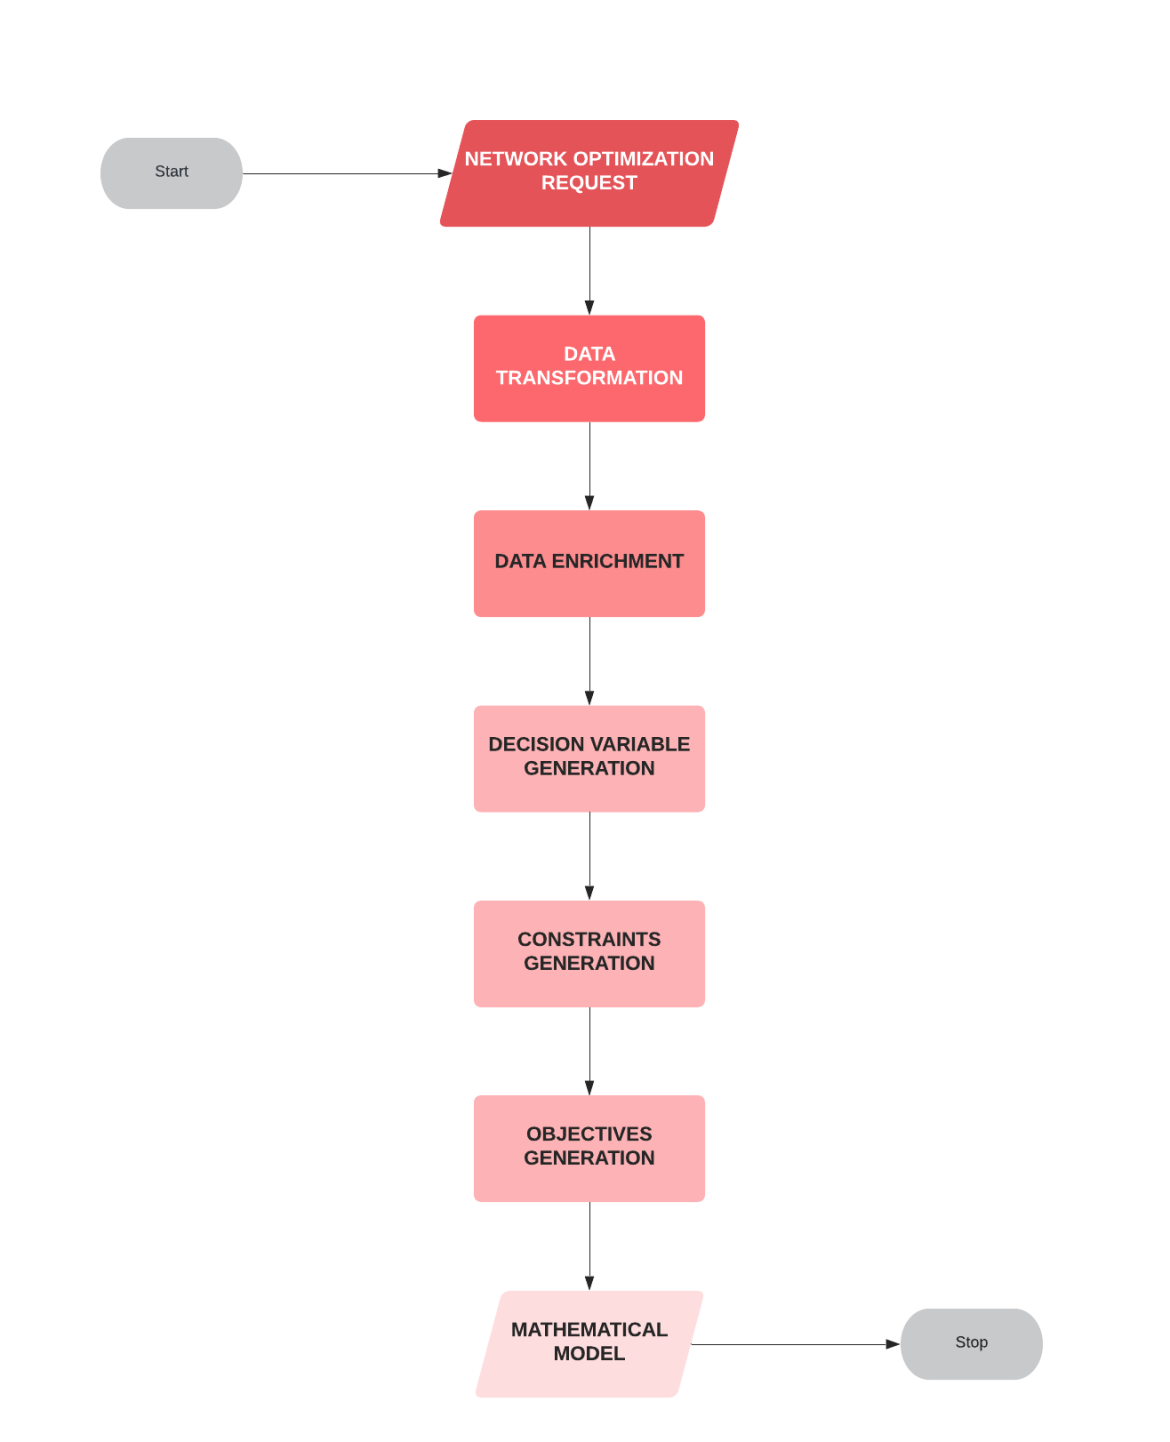 workflow that drives network optimization